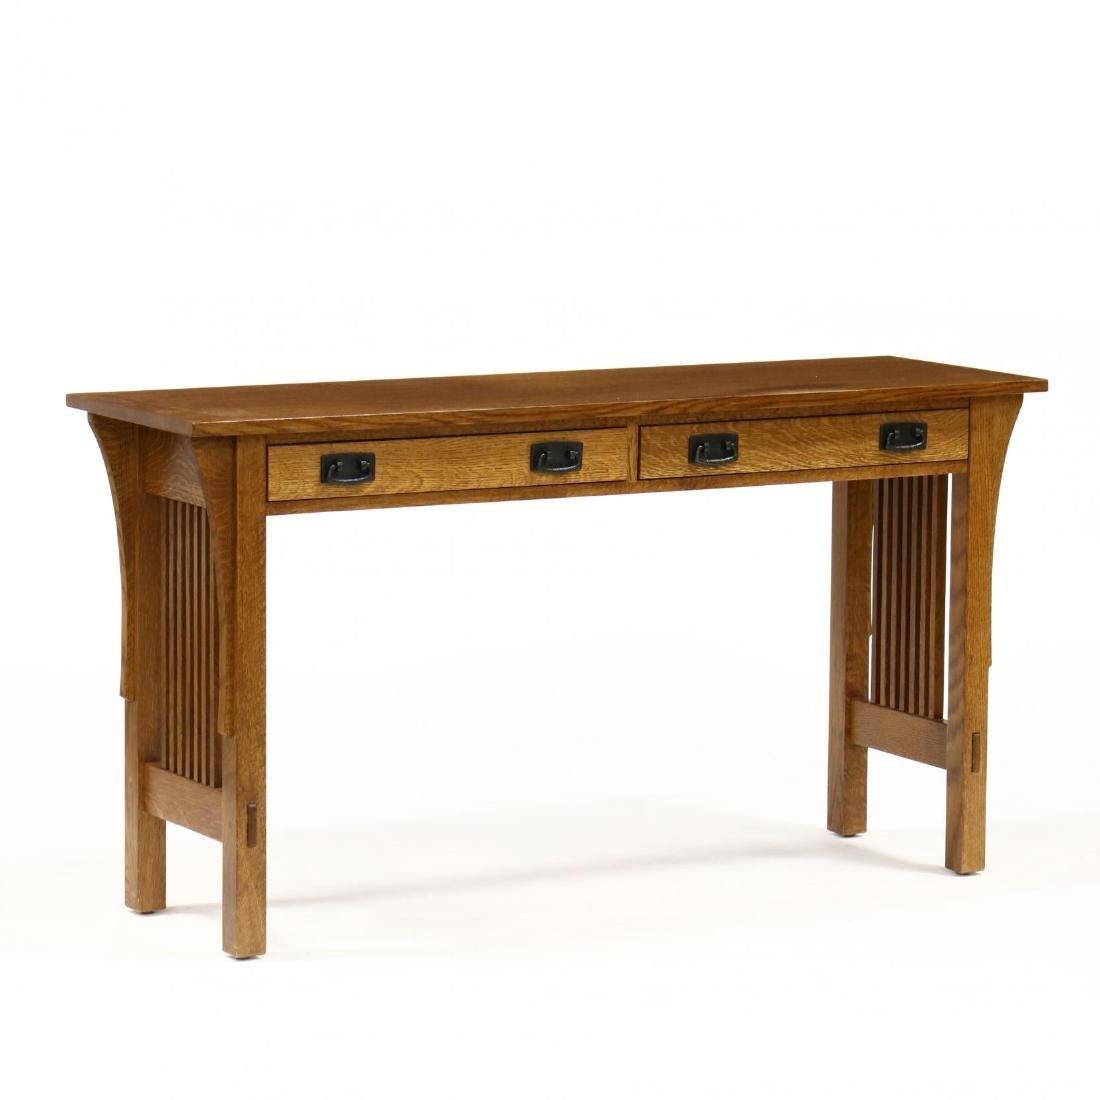 Stickley, Misson Style Oak Console Table